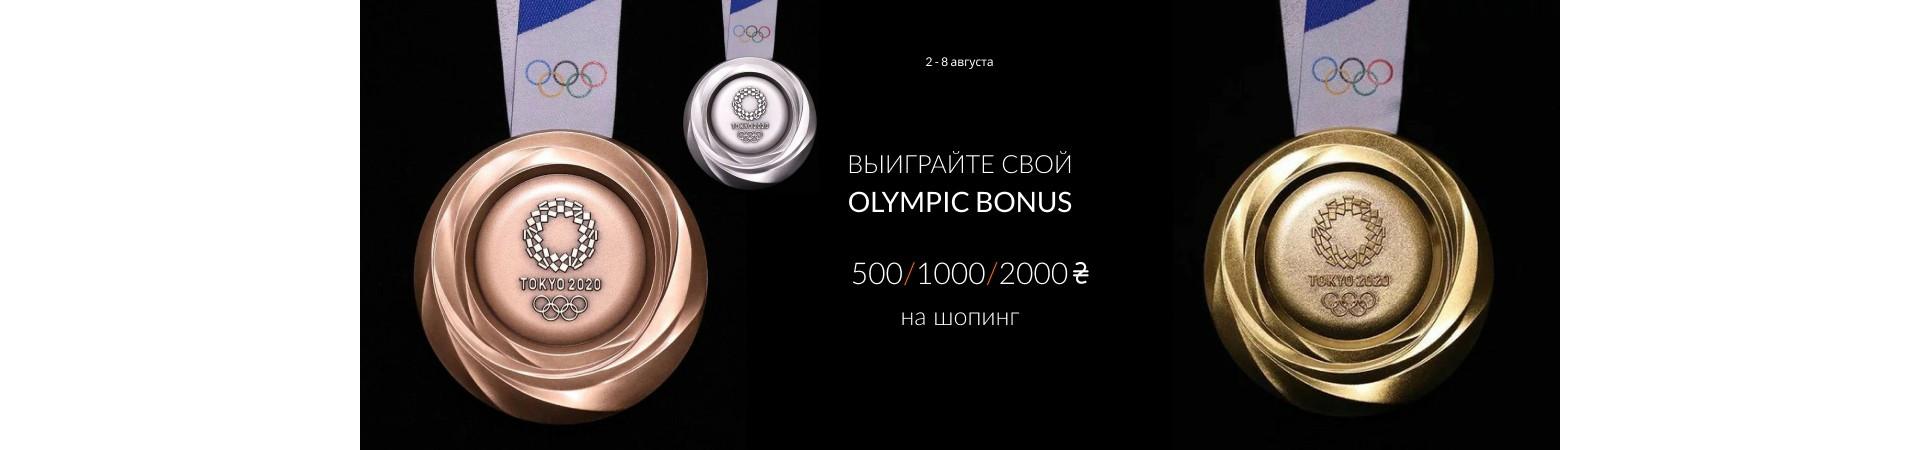 Olympic Bonus